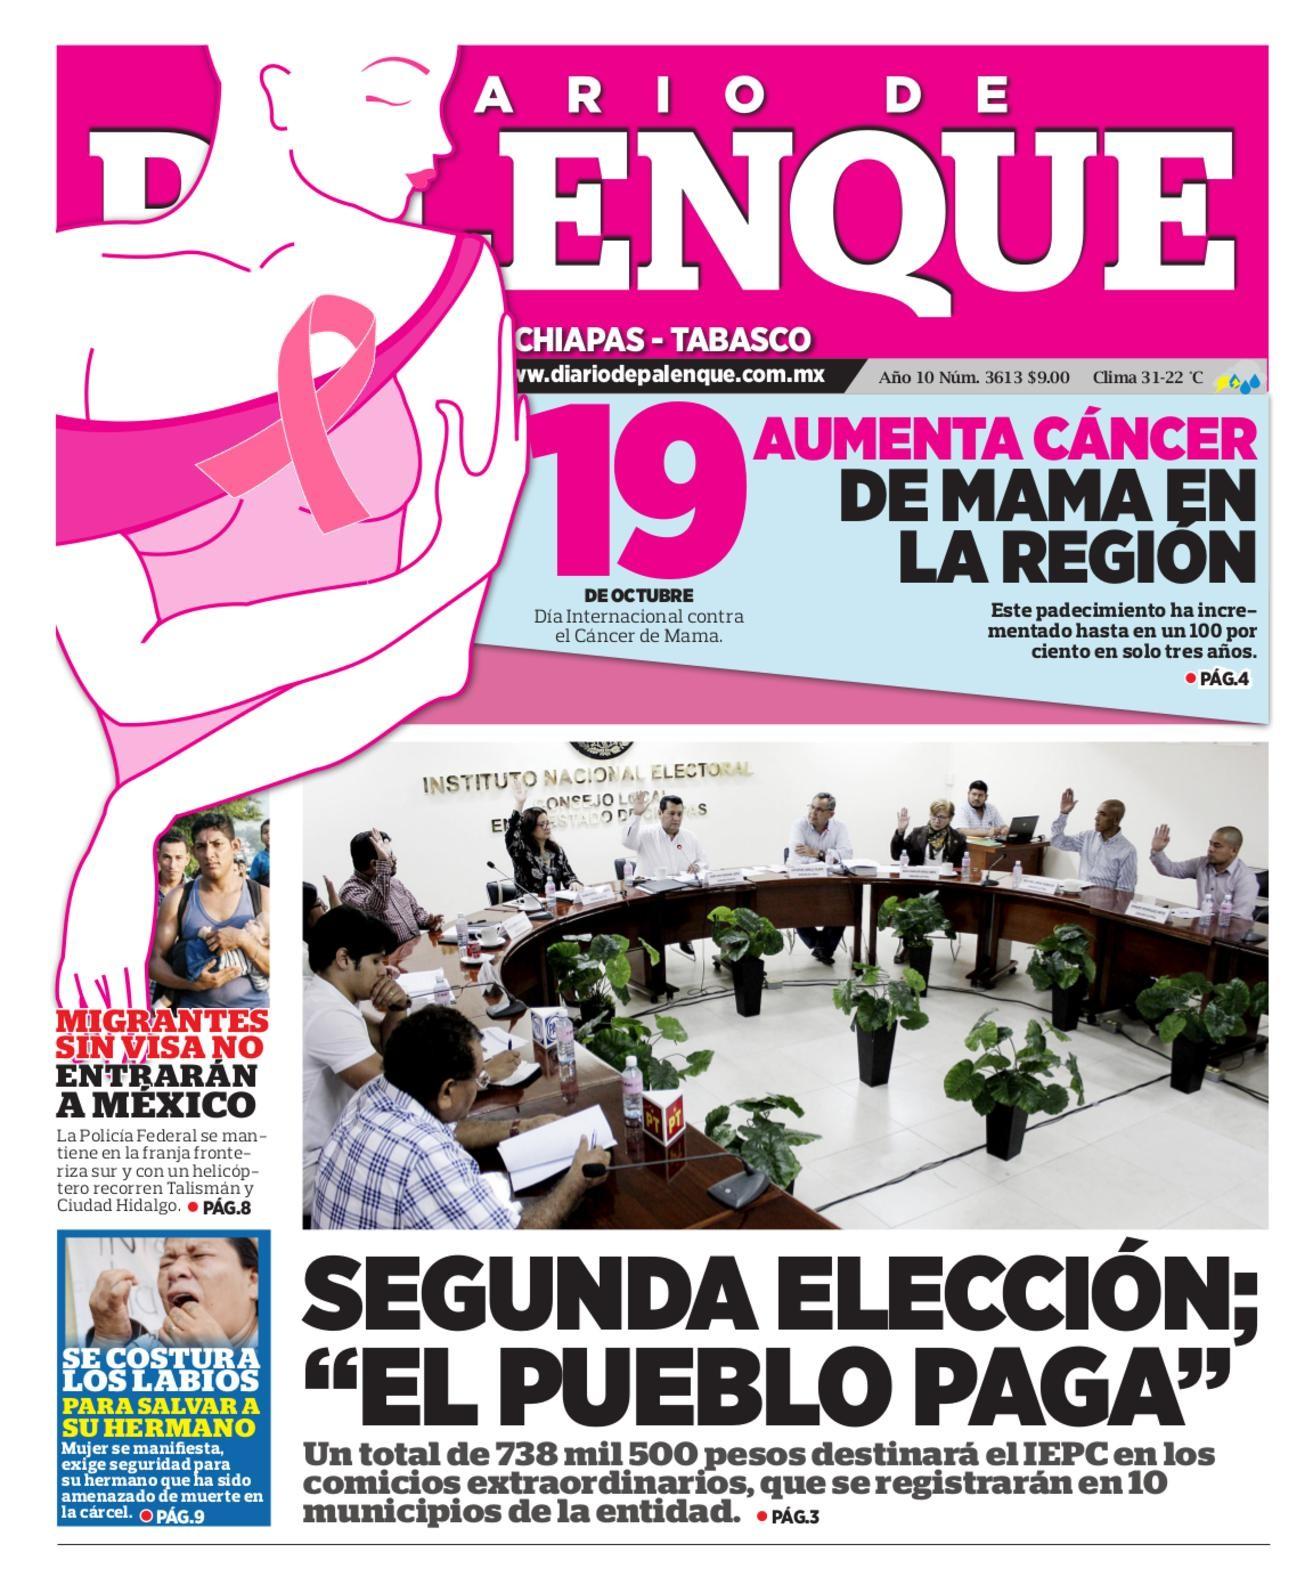 Calendario Escolar 2019 Tamaulipas Más Reciente Calaméo Diario 19 10 2018 Of Calendario Escolar 2019 Tamaulipas Más Arriba-a-fecha Peri³dico Abc 31 De Agosto De 2018 Pages 1 16 Text Version